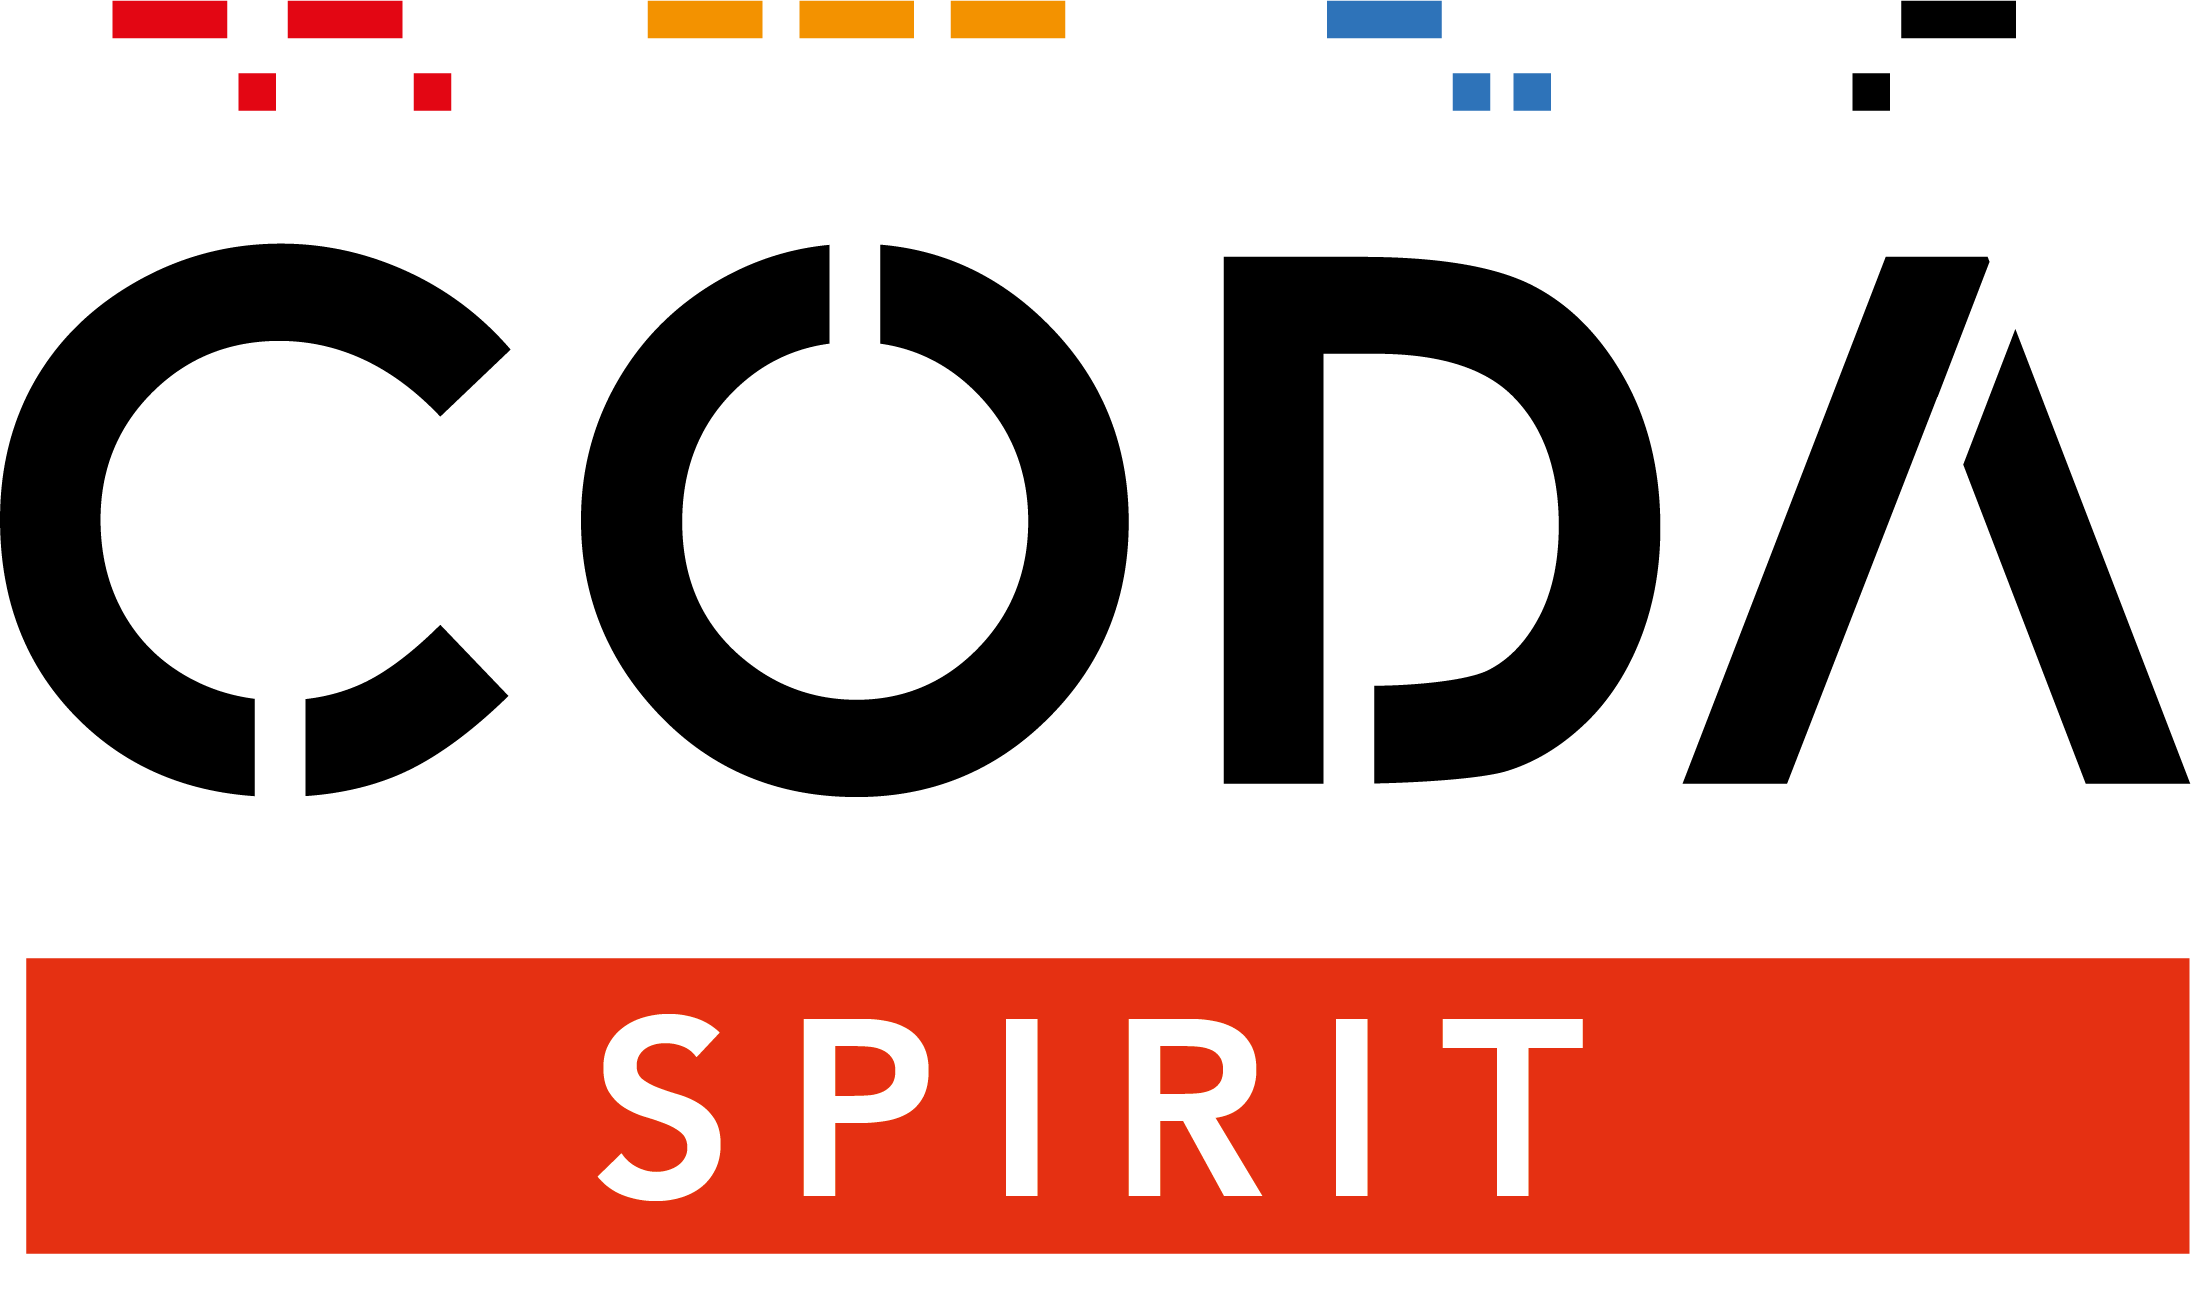 CODA_SPIRIT_13_INCH_WINDOWS_10_LAPTOP